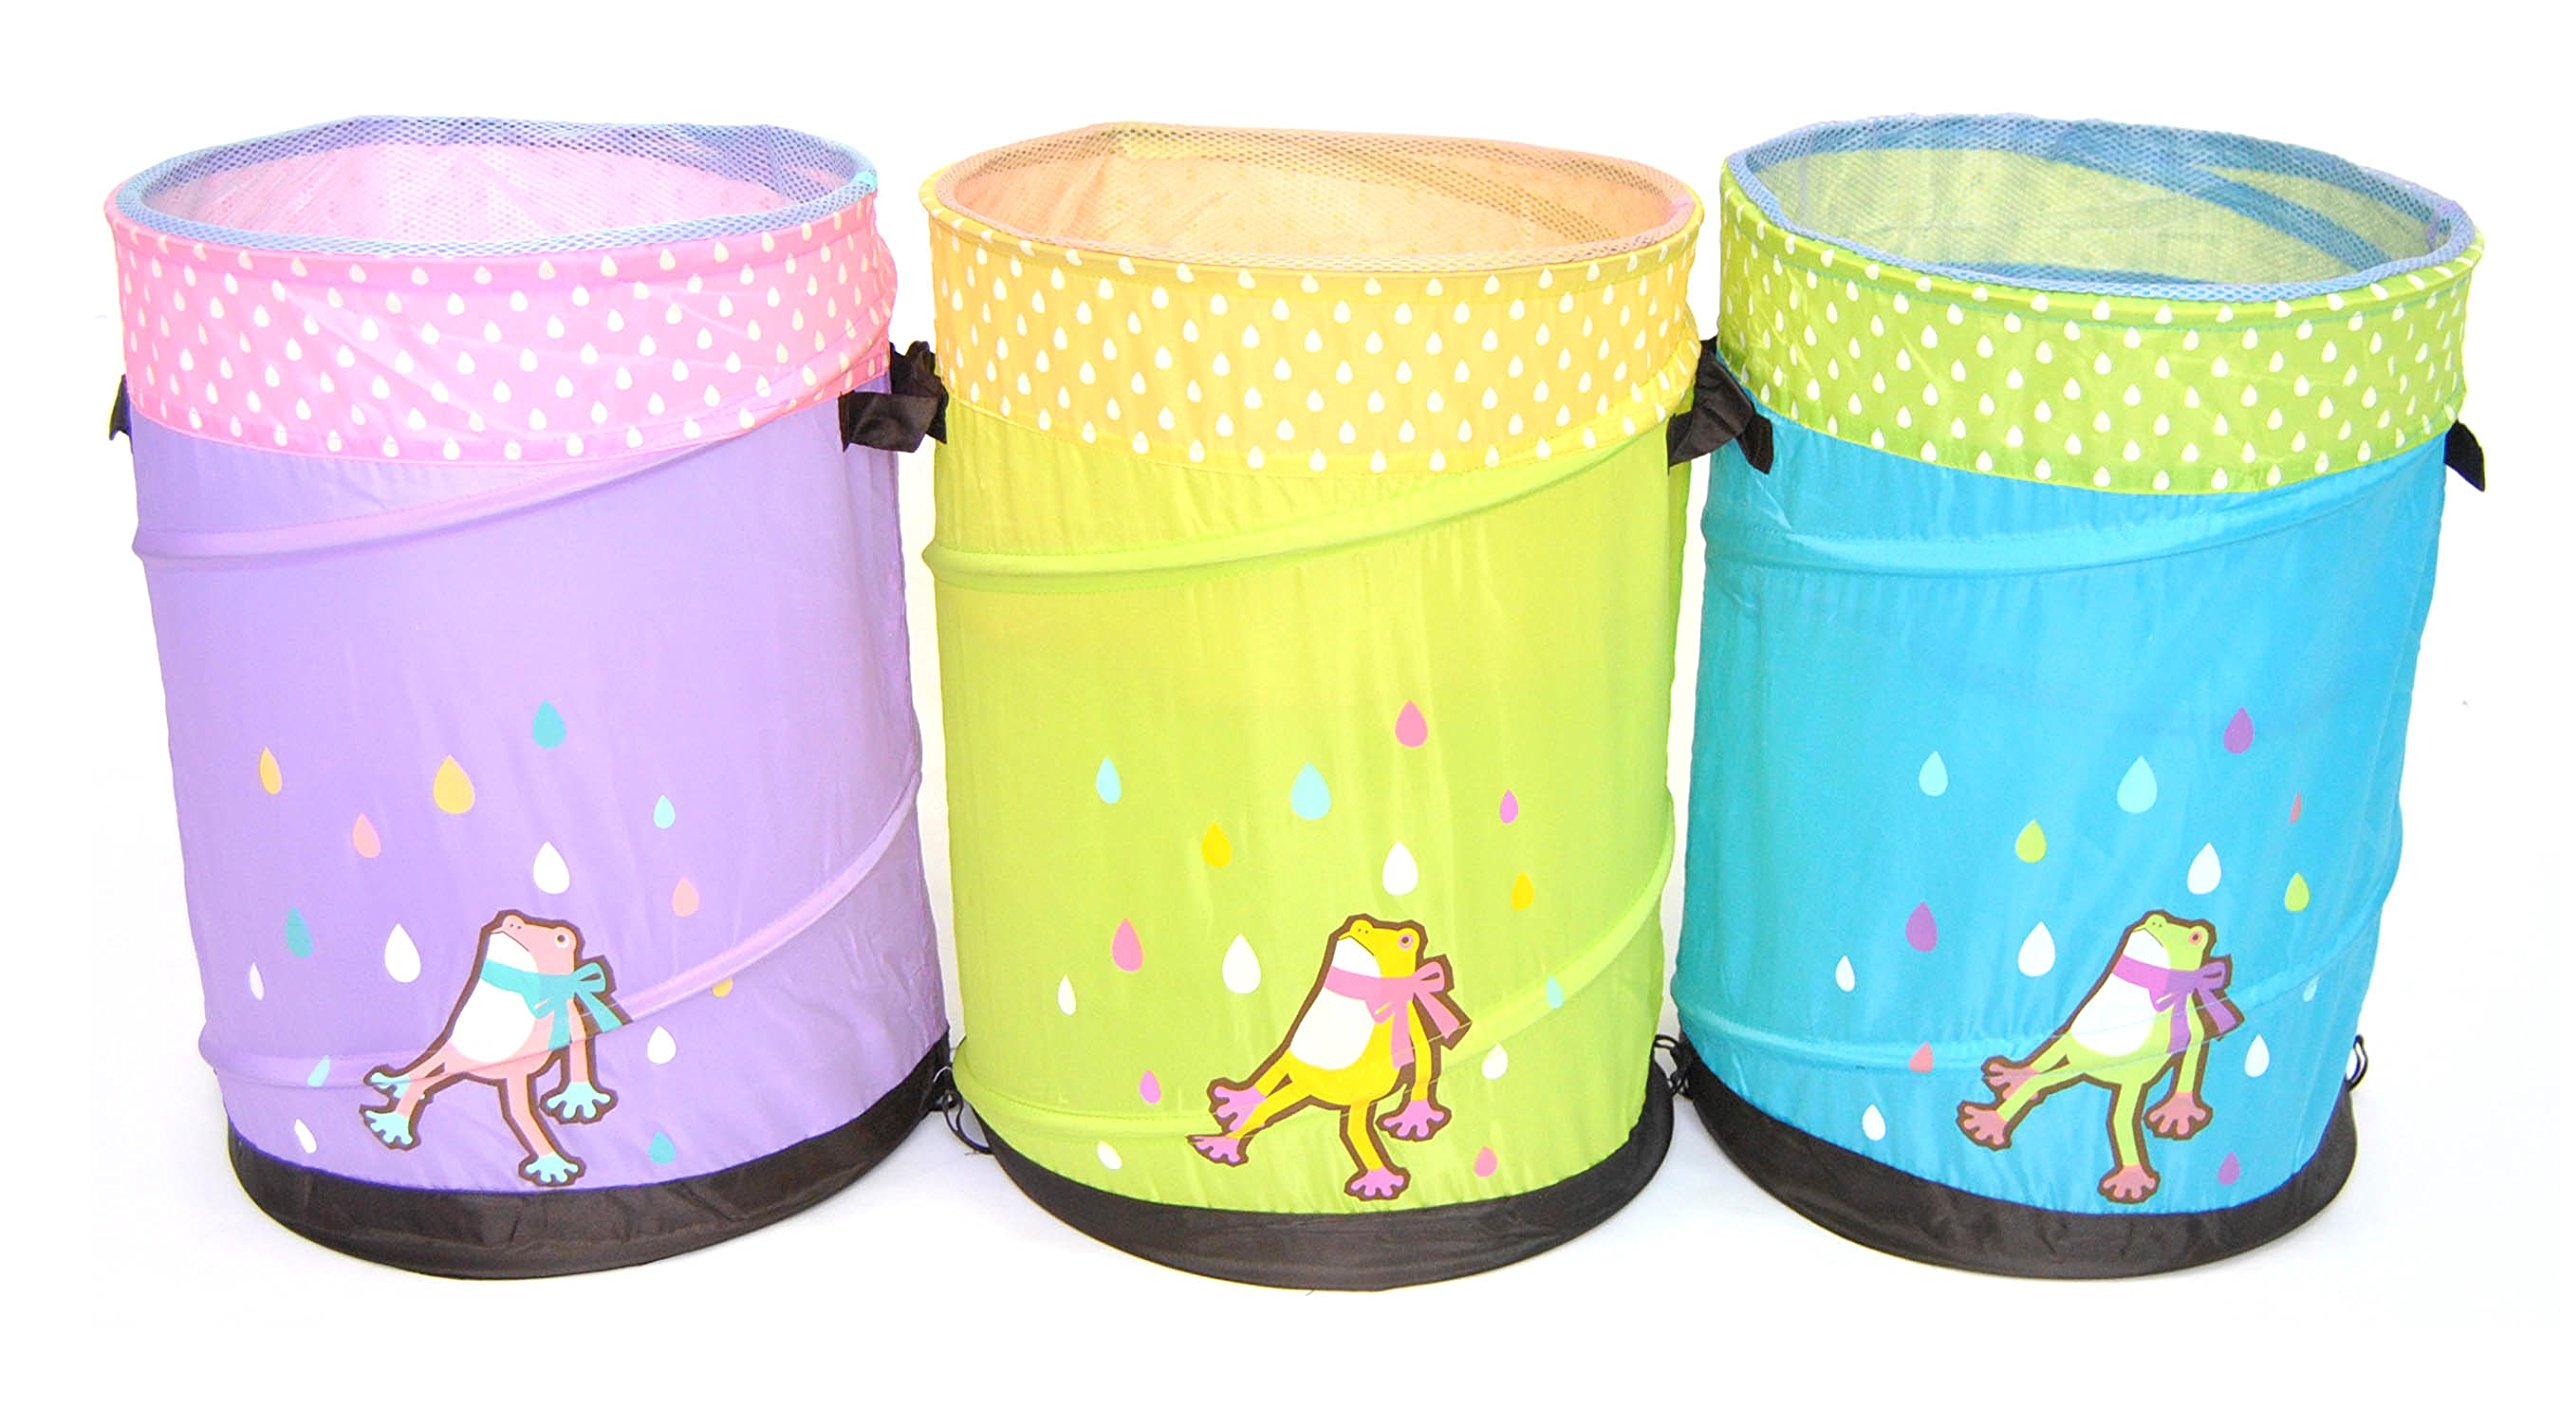 Set of 3 Pop-up Hamper Storage Bin / Basket / Container - Mr. Organize Frog for Children: Green, Blue and Purple